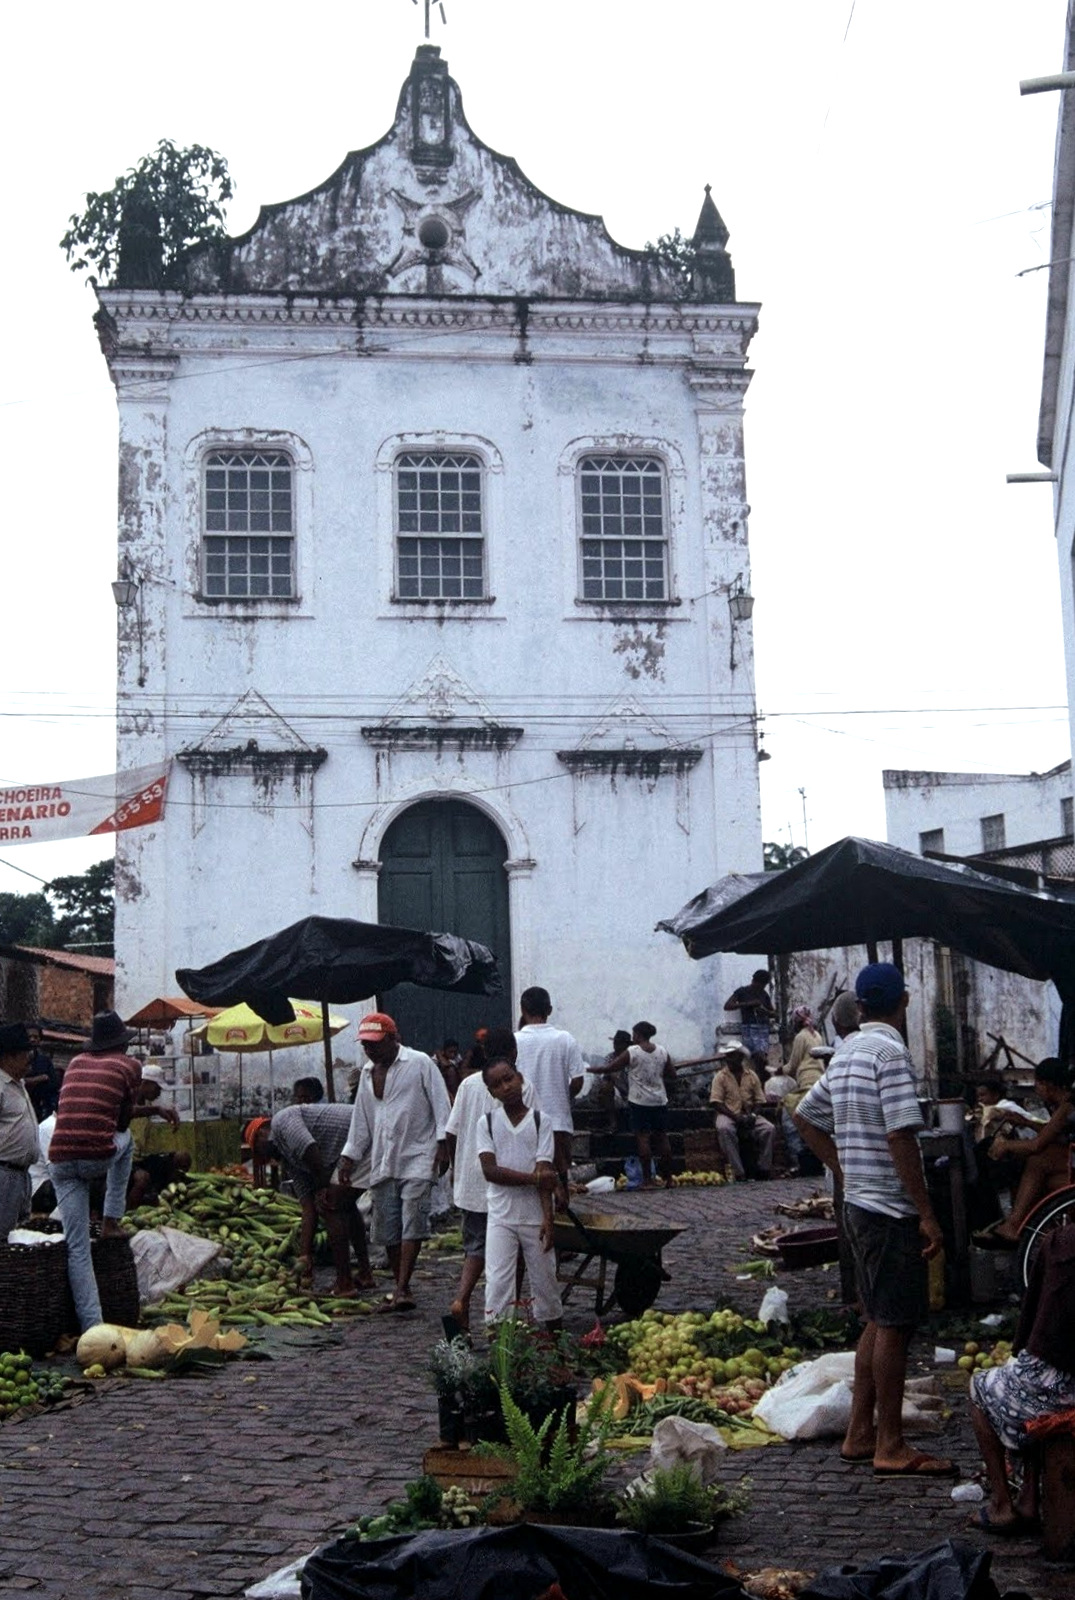 Bahia : Cachoeira mercado